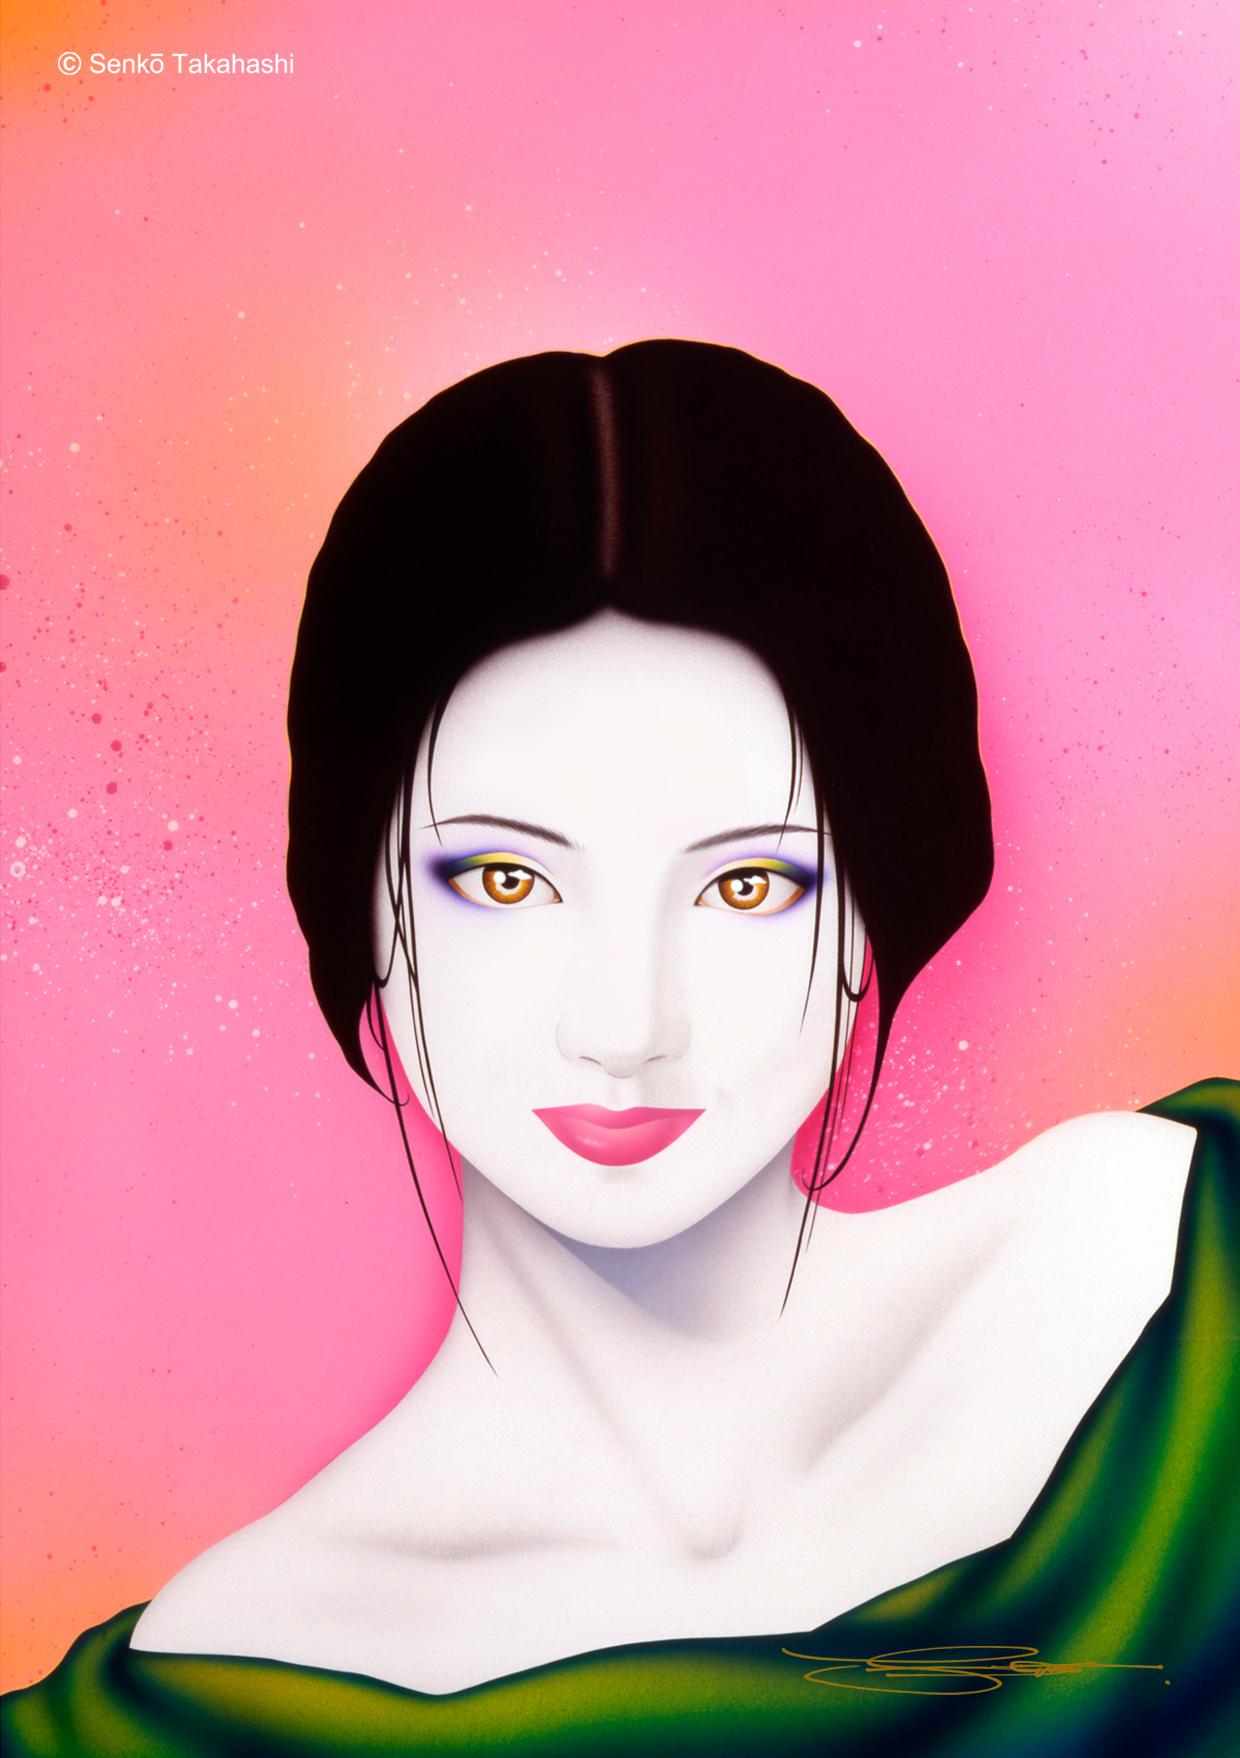 若菜-wakana-2001-B3